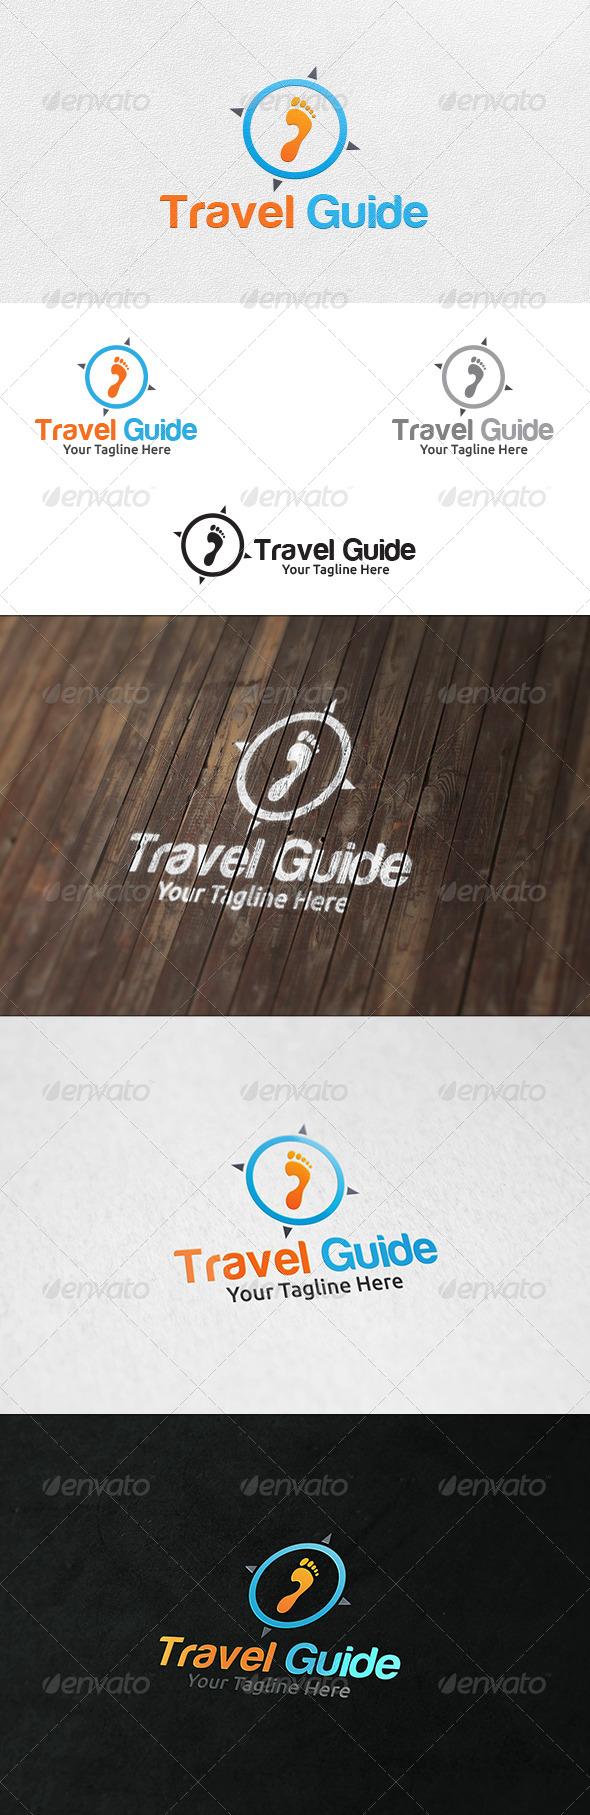 GraphicRiver Travel Guide Logo Template 6827343